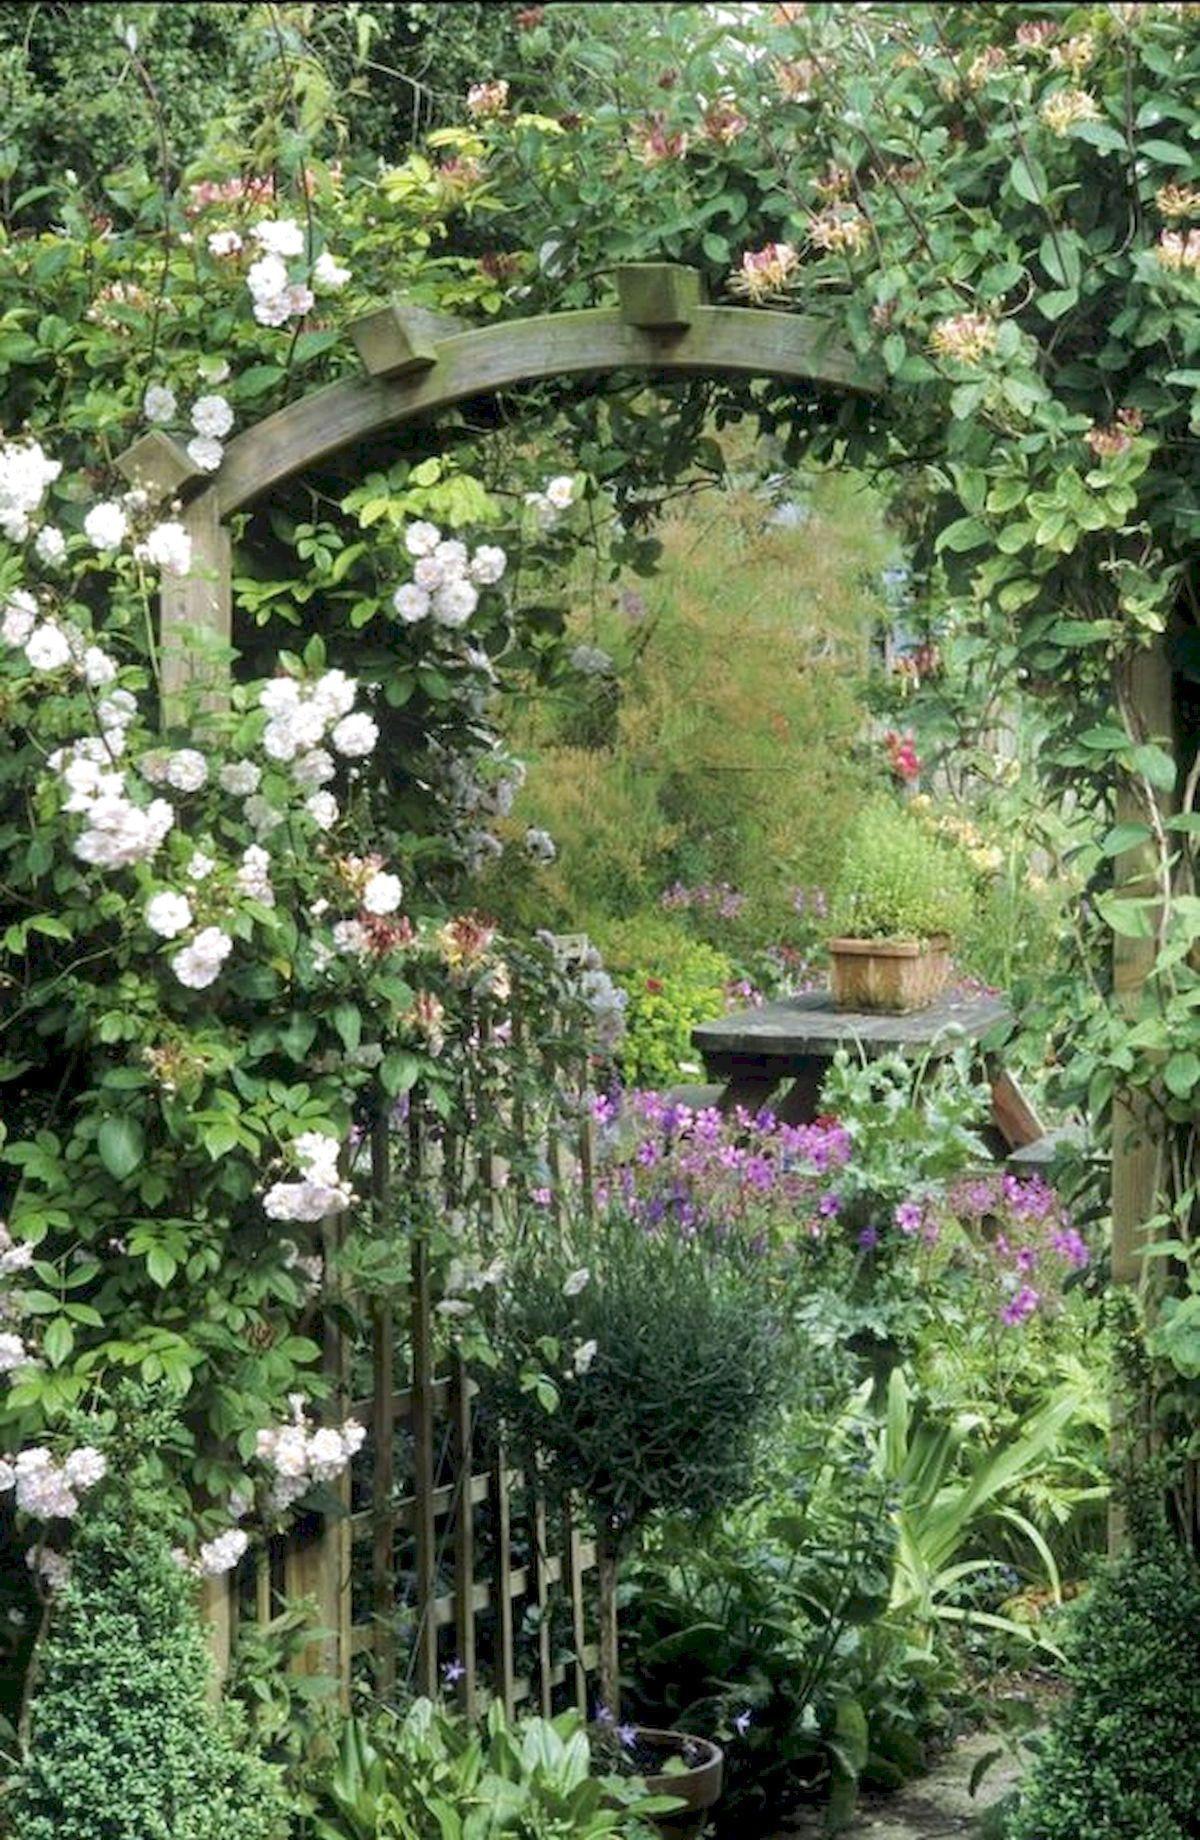 77 Favourite Pinterest Garden Decor Ideas Garden Design